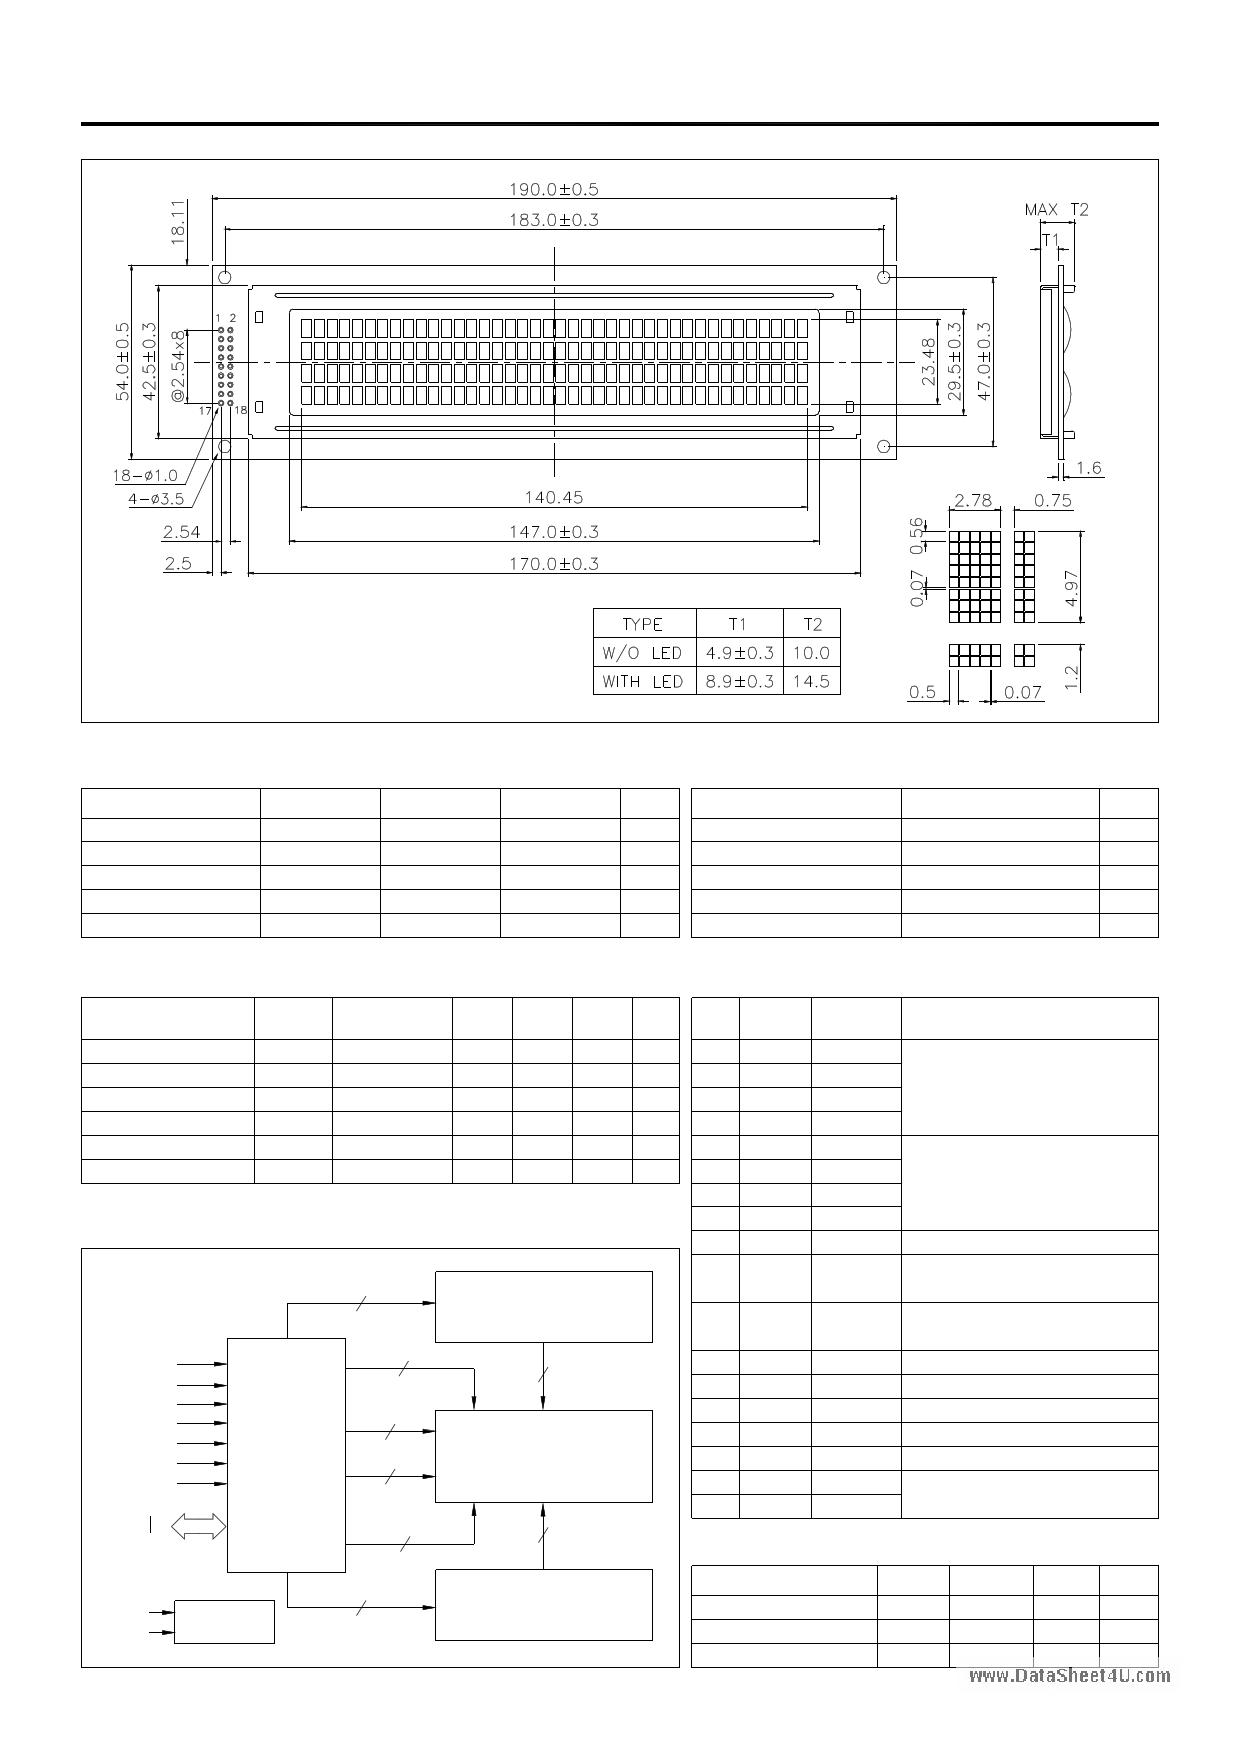 LC4041-LY datasheet